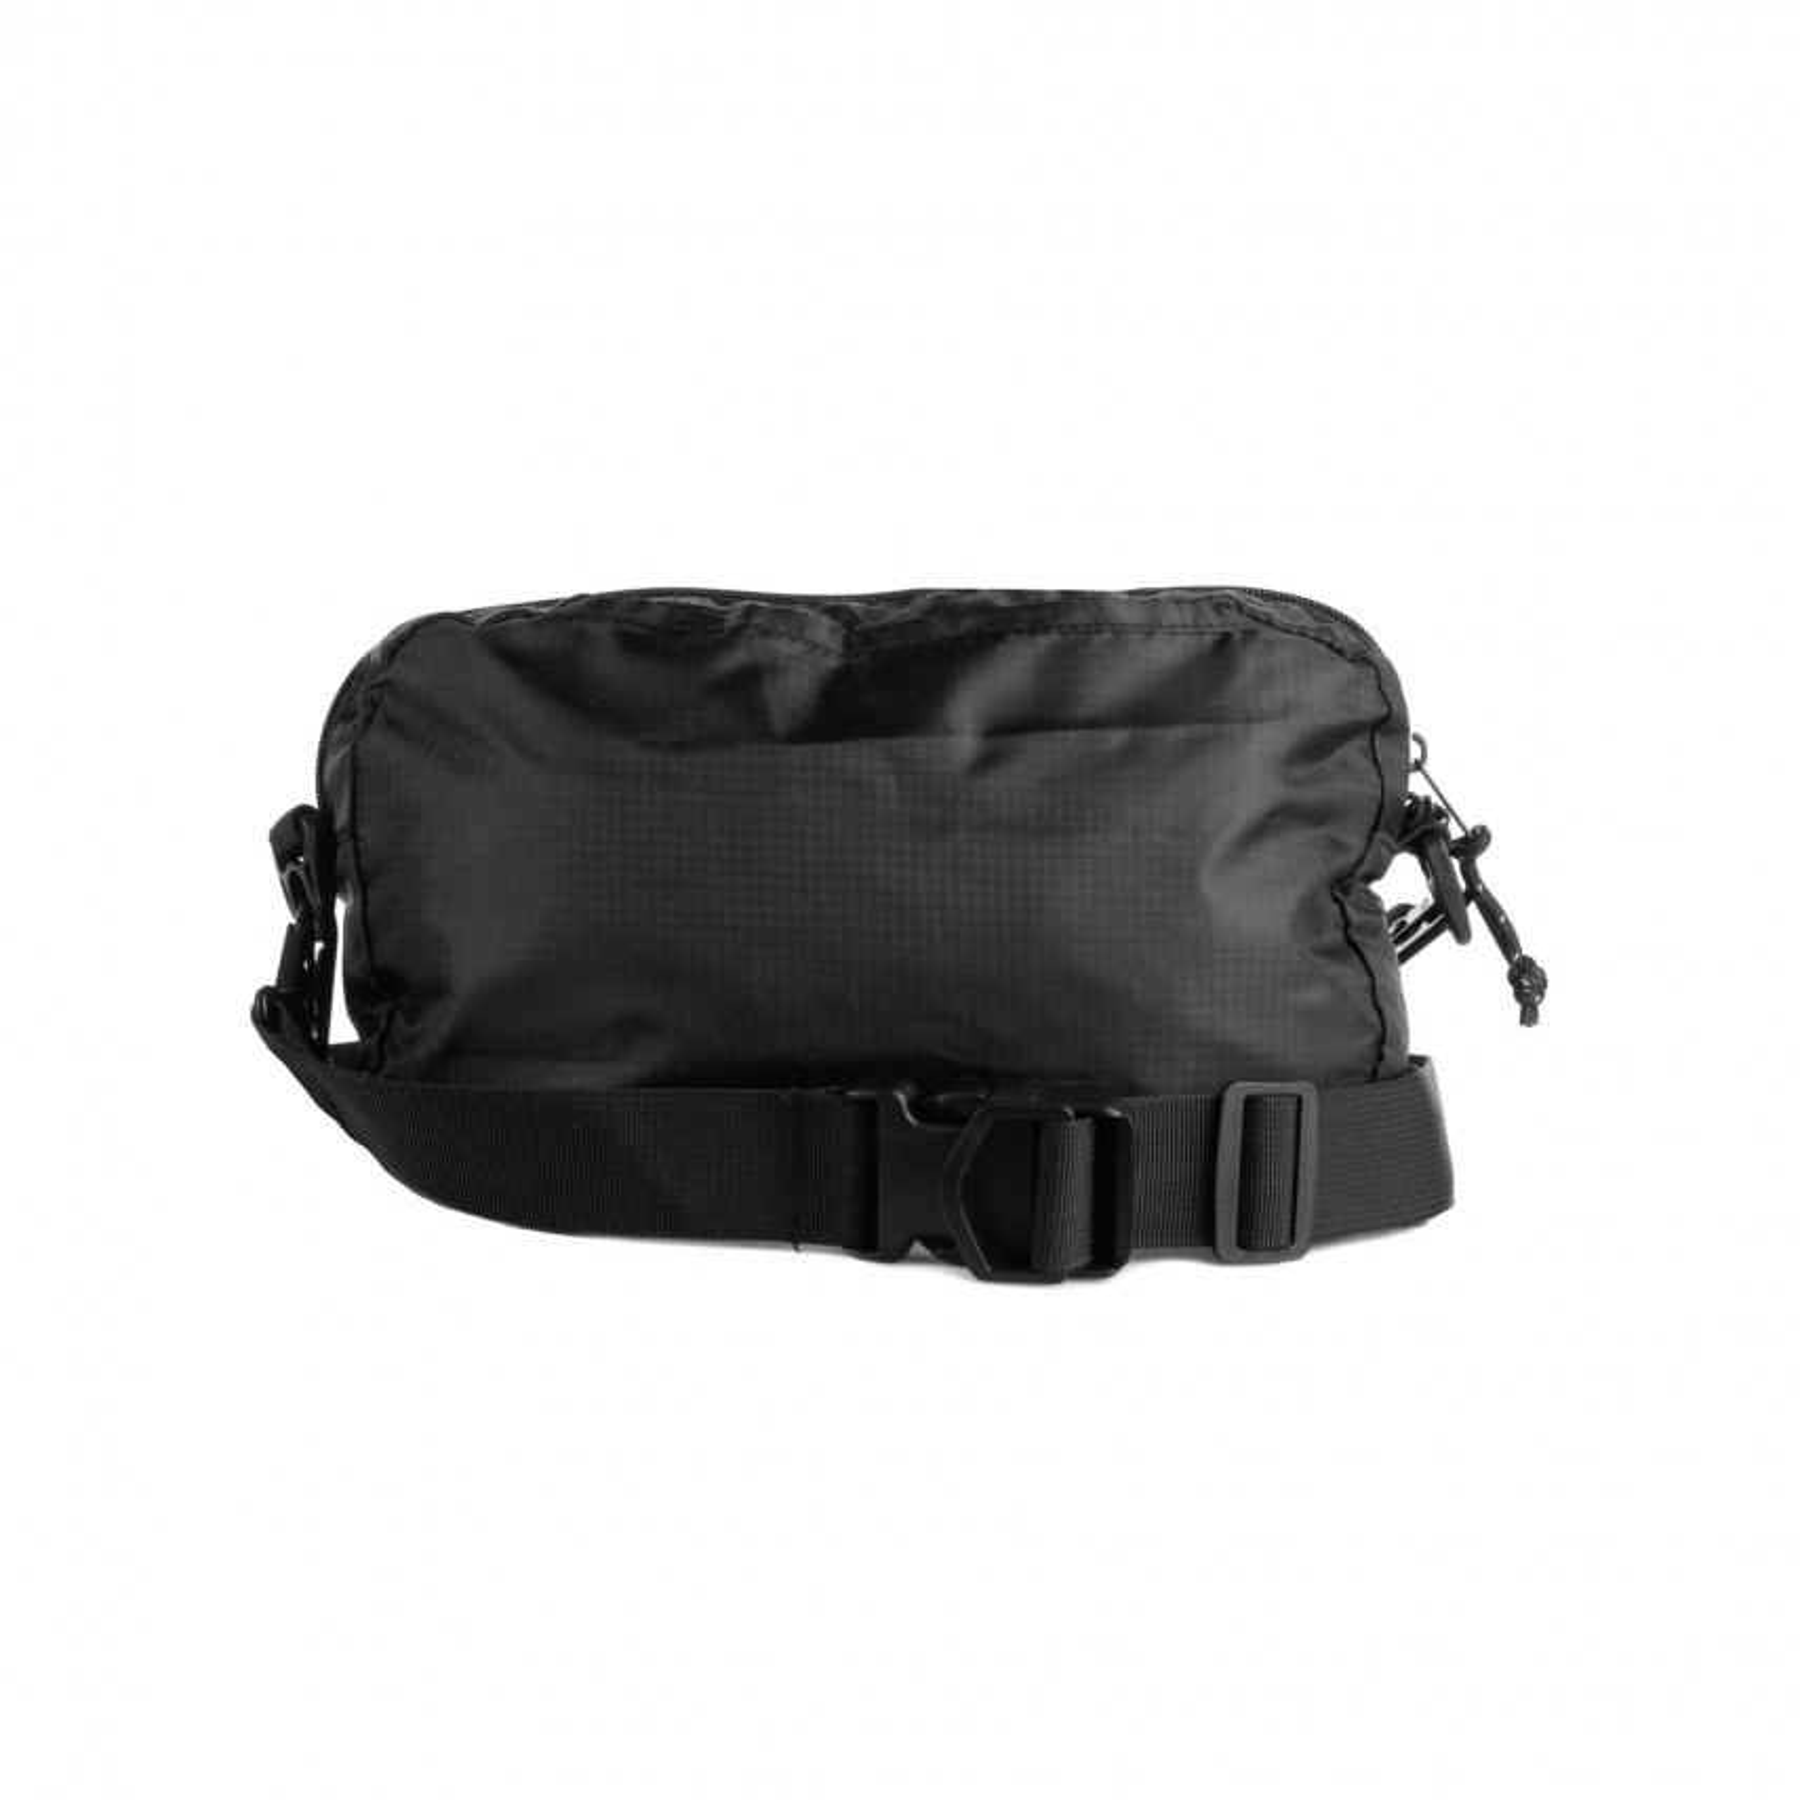 TRACOLLA COMMUTER TRAVELER BAG